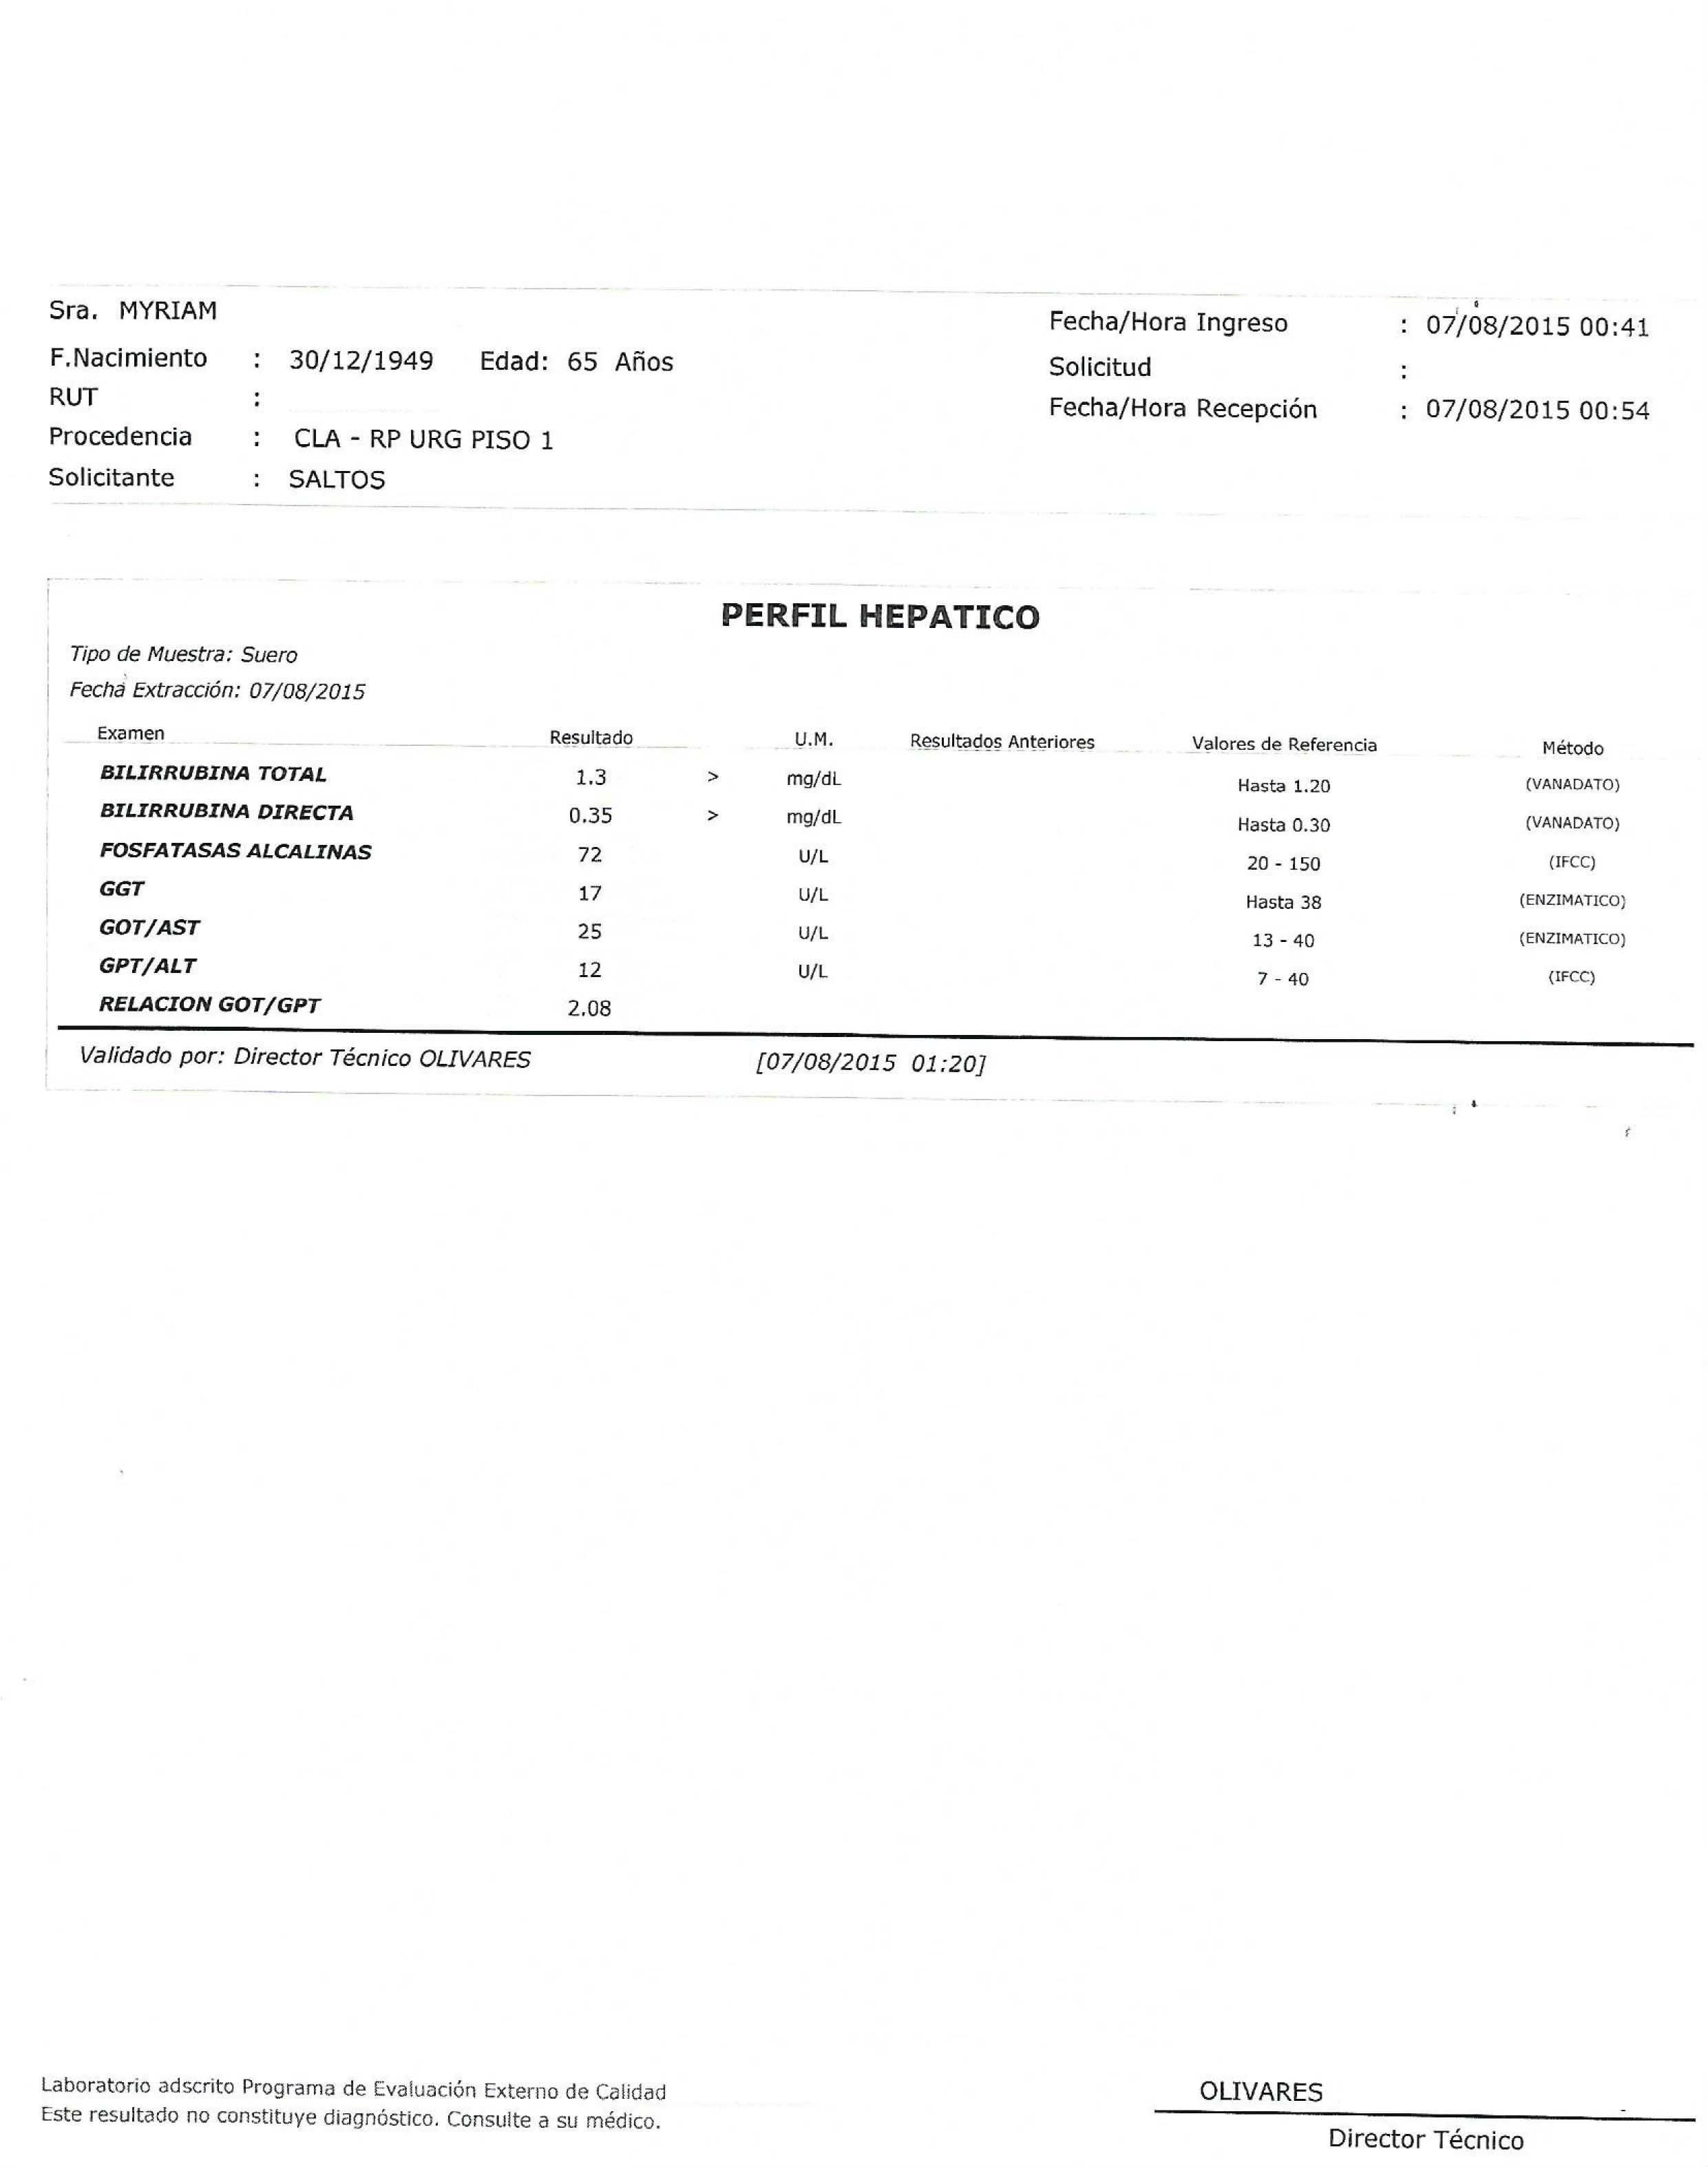 LifEscozul® - Miriam 1 - Cáncer de Pulmon